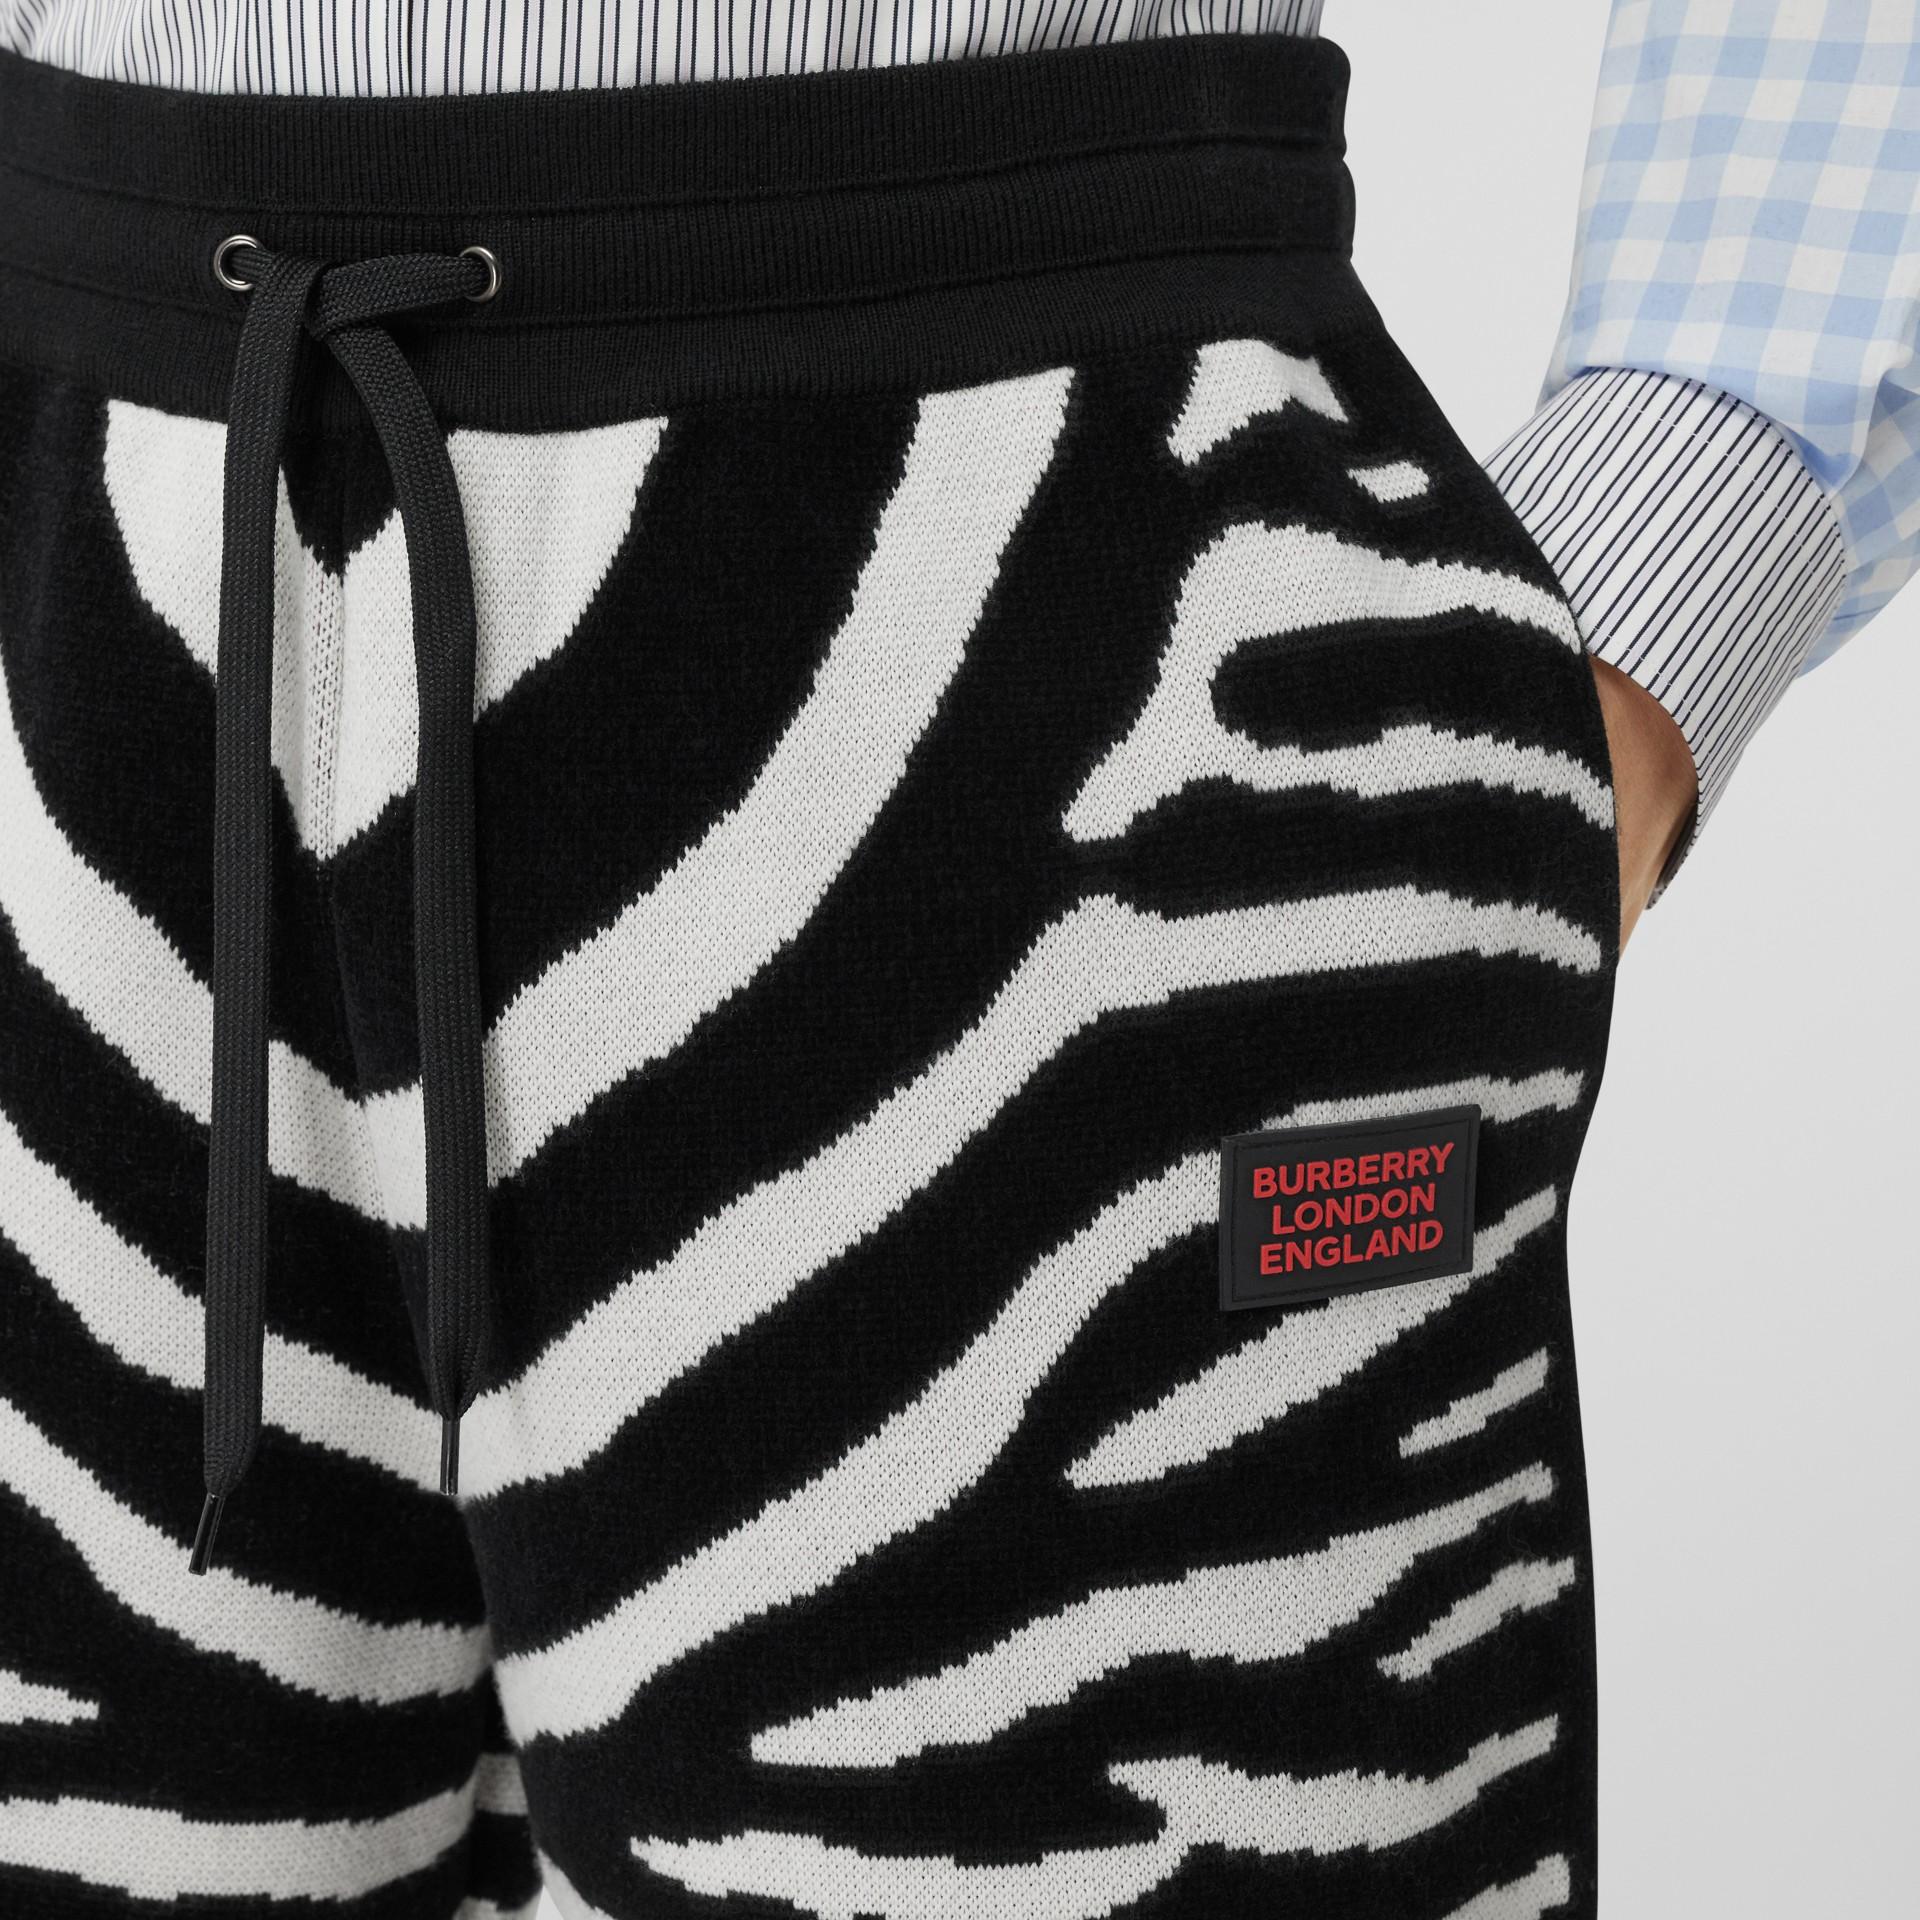 Zebra Wool Blend Jacquard Drawcord Shorts in Black | Burberry United Kingdom - gallery image 1